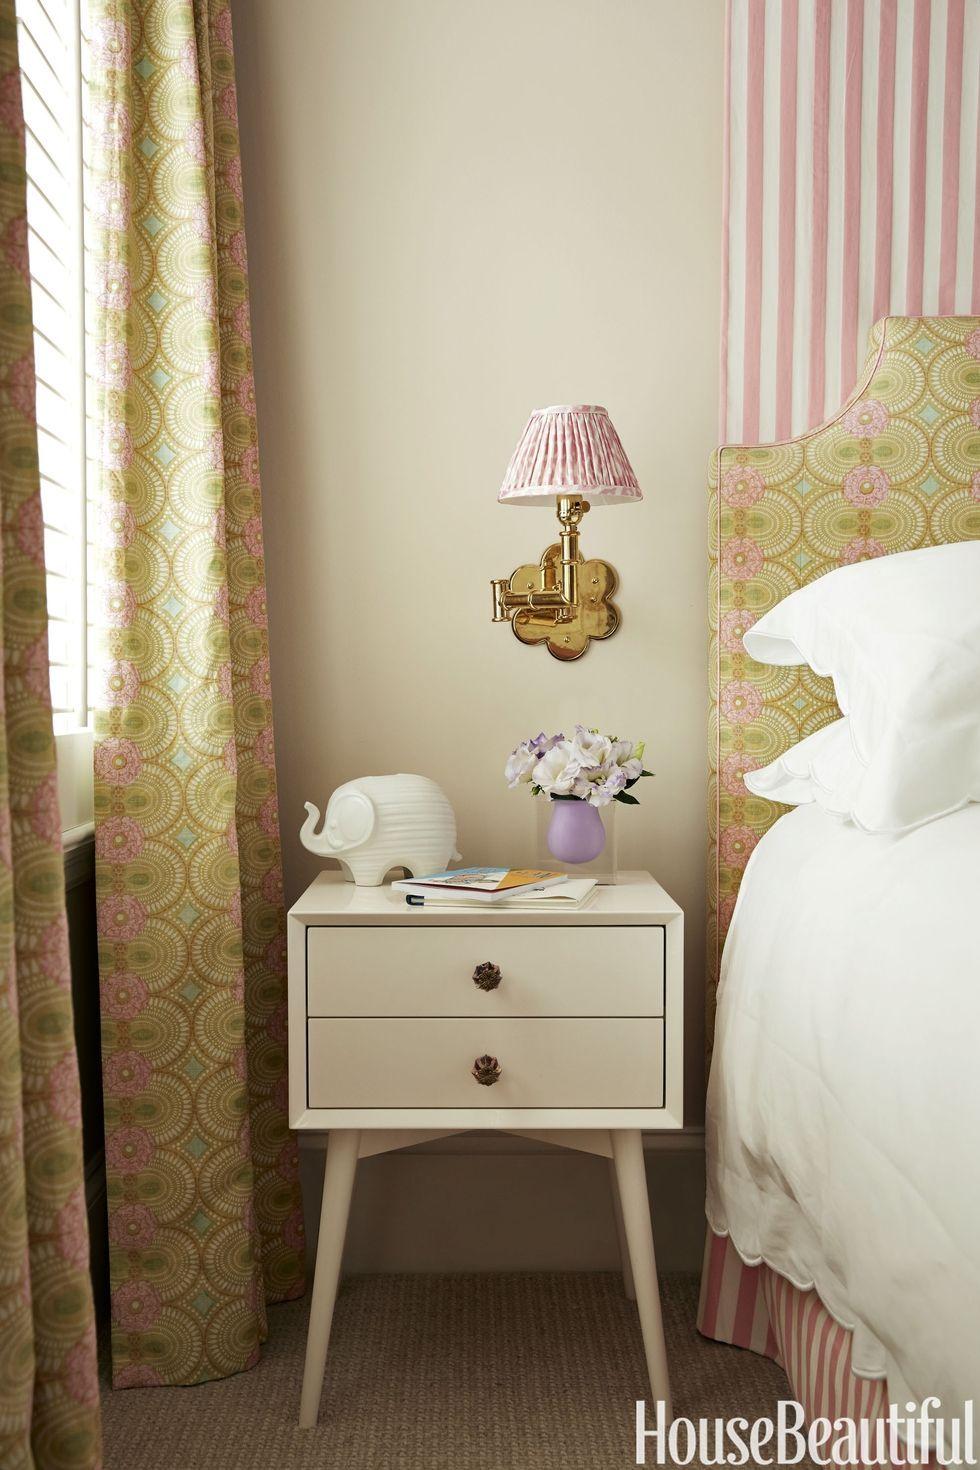 In the daughteru0027s room Soane Britainu0027s Petal